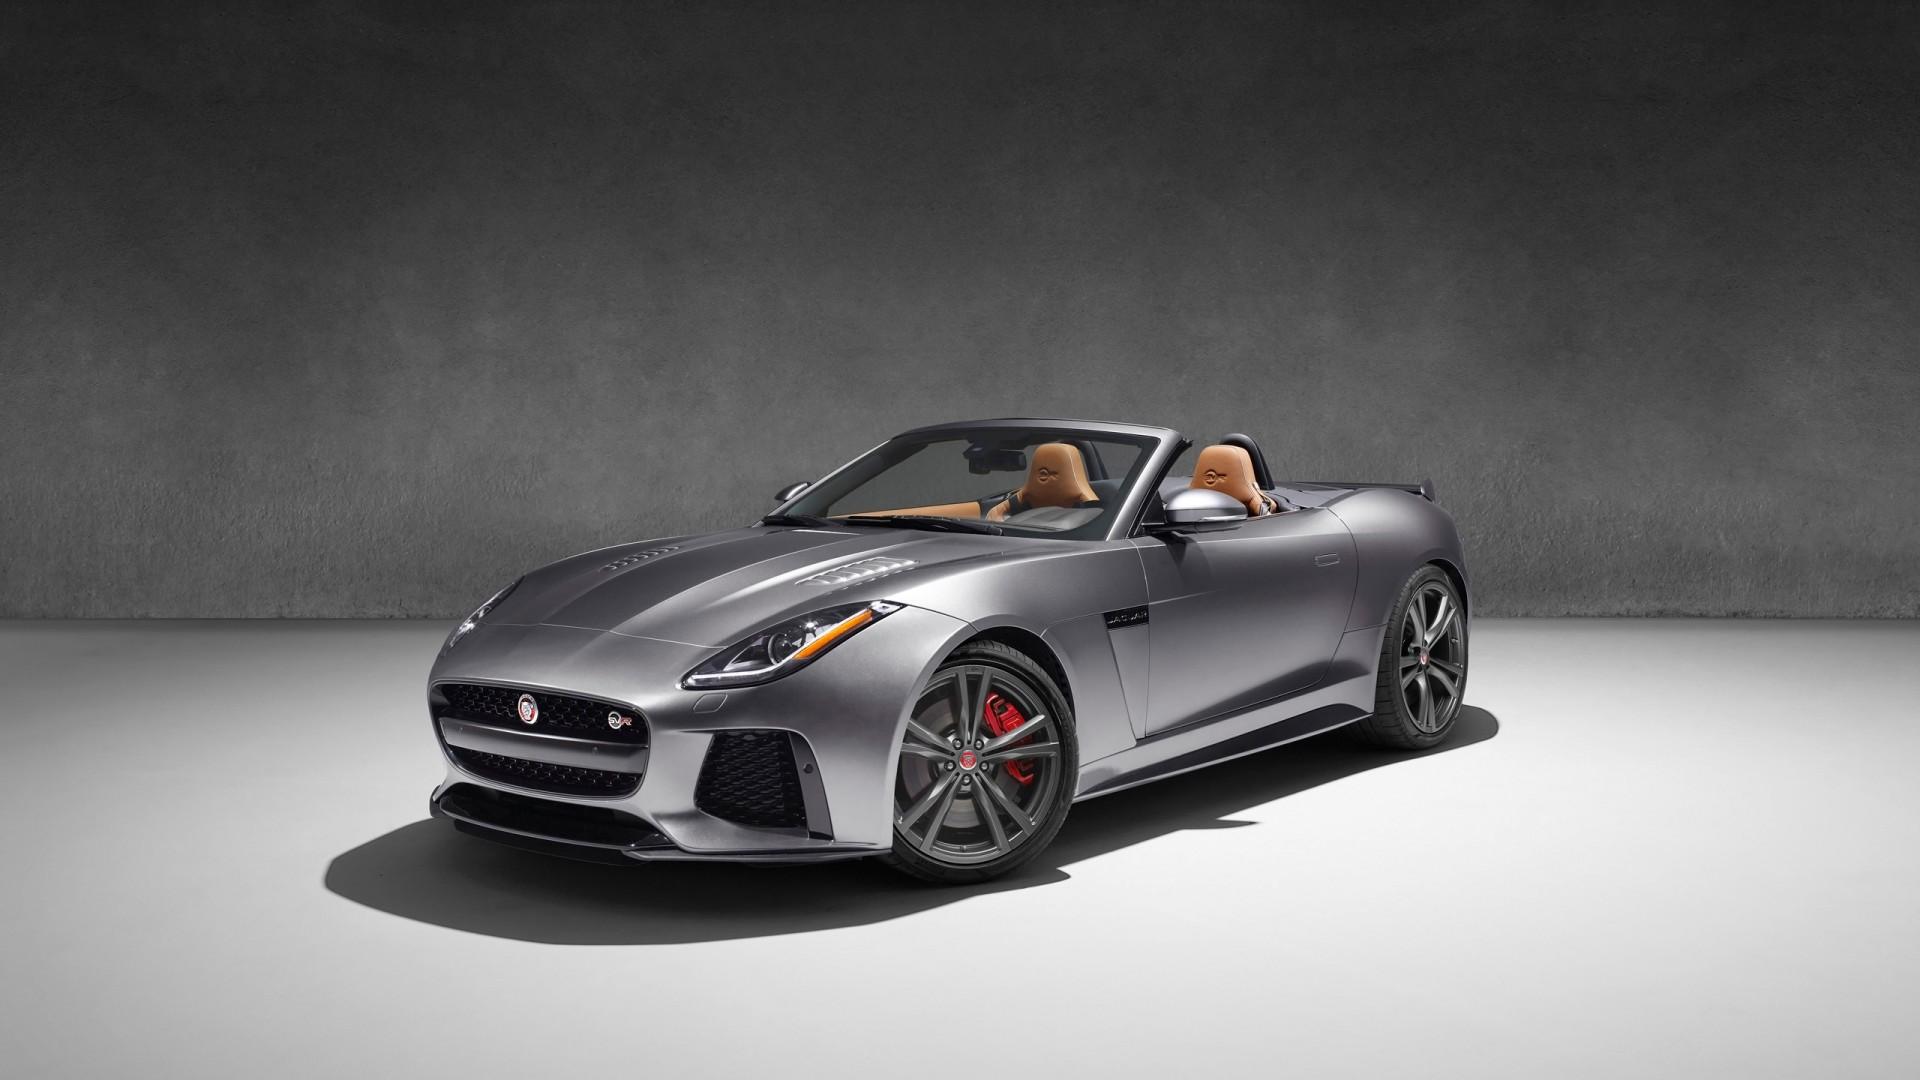 3d Silver Grey Wallpaper Jaguar F Type Svr Convertible 2017 Wallpapers Hd